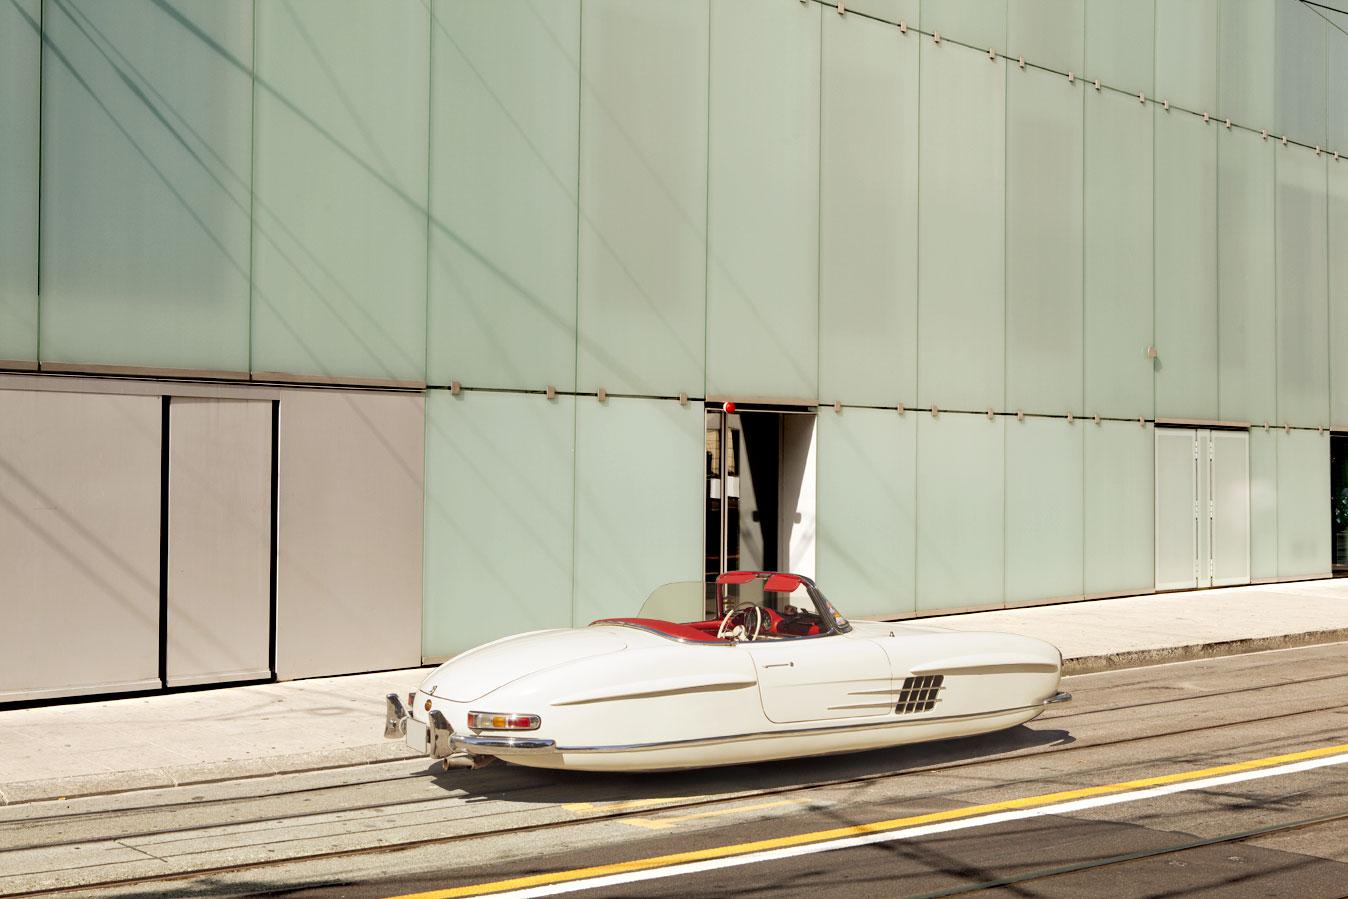 Bentley Fall Wallpaper Air Drive The Jetsons Meets Beautiful Digital Art